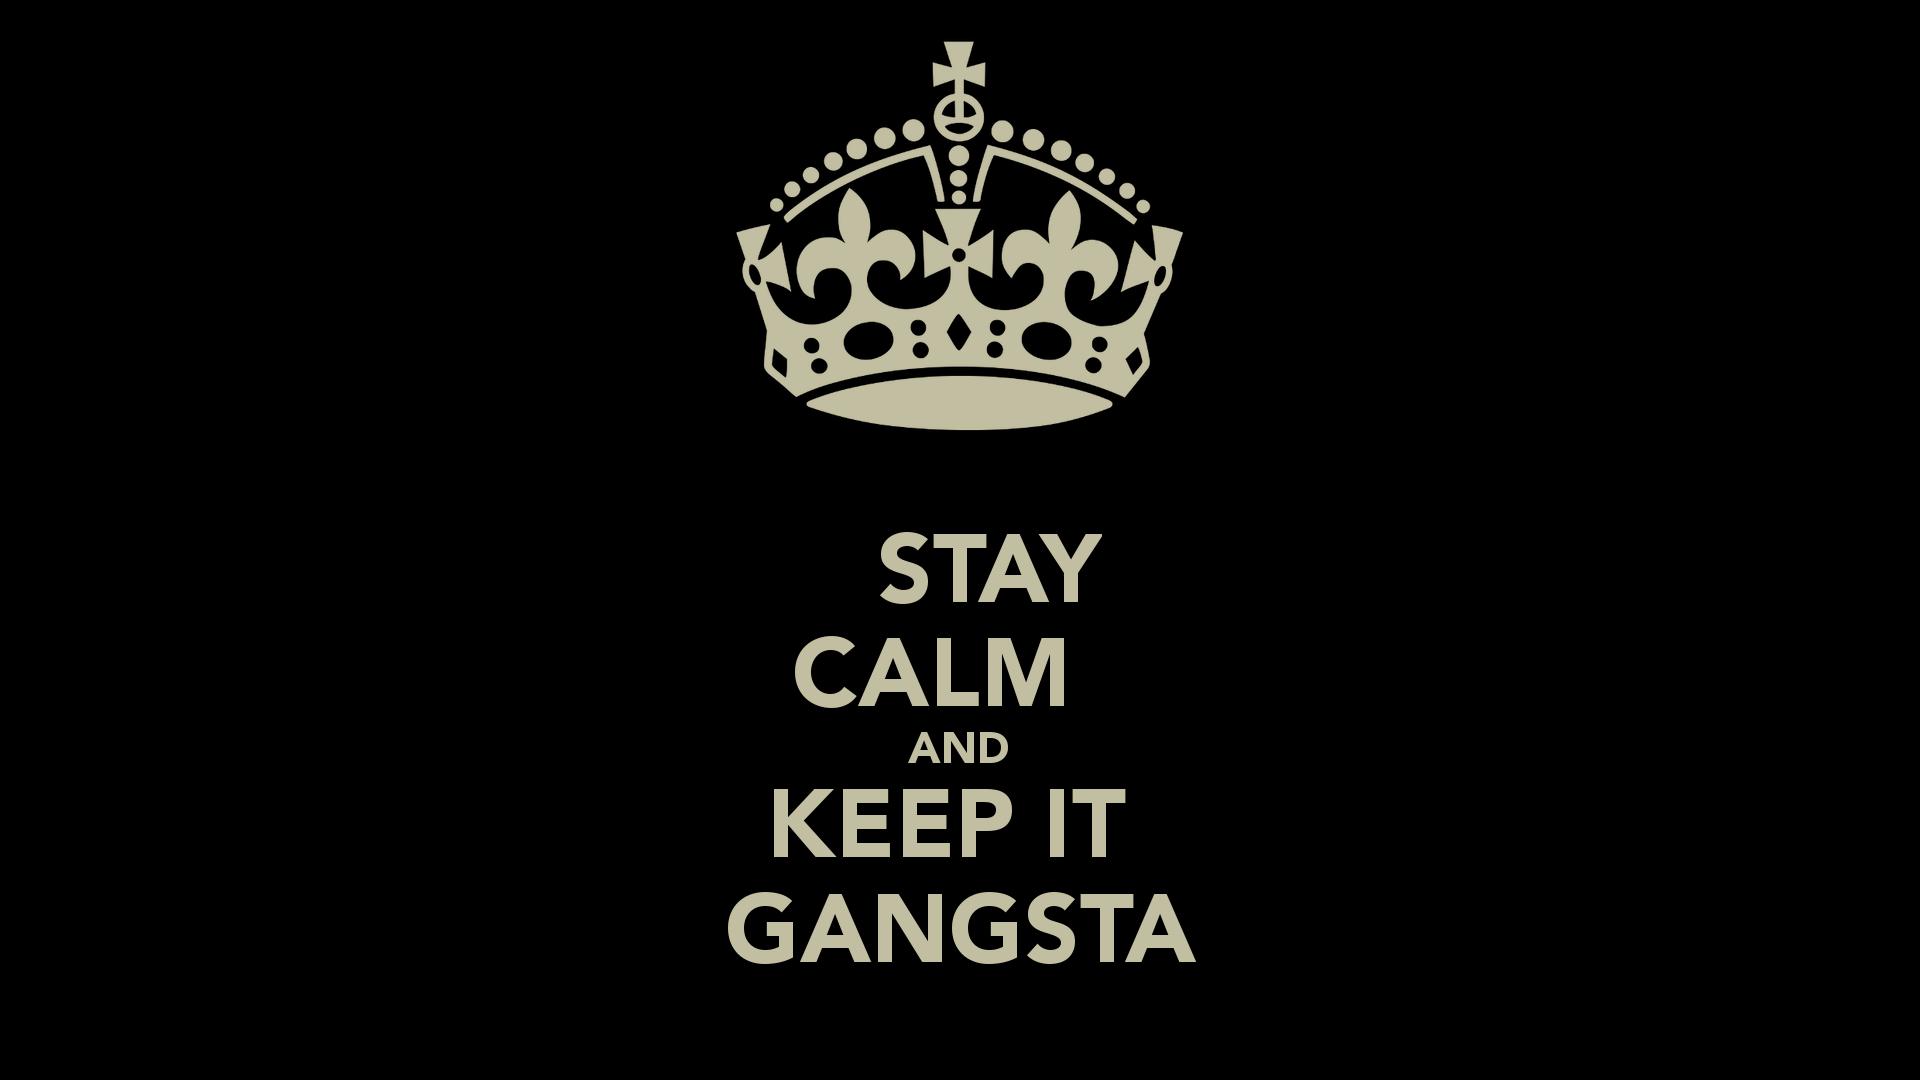 Download Wallpaper Logo Gangster - wp2605804  Trends_662391.png